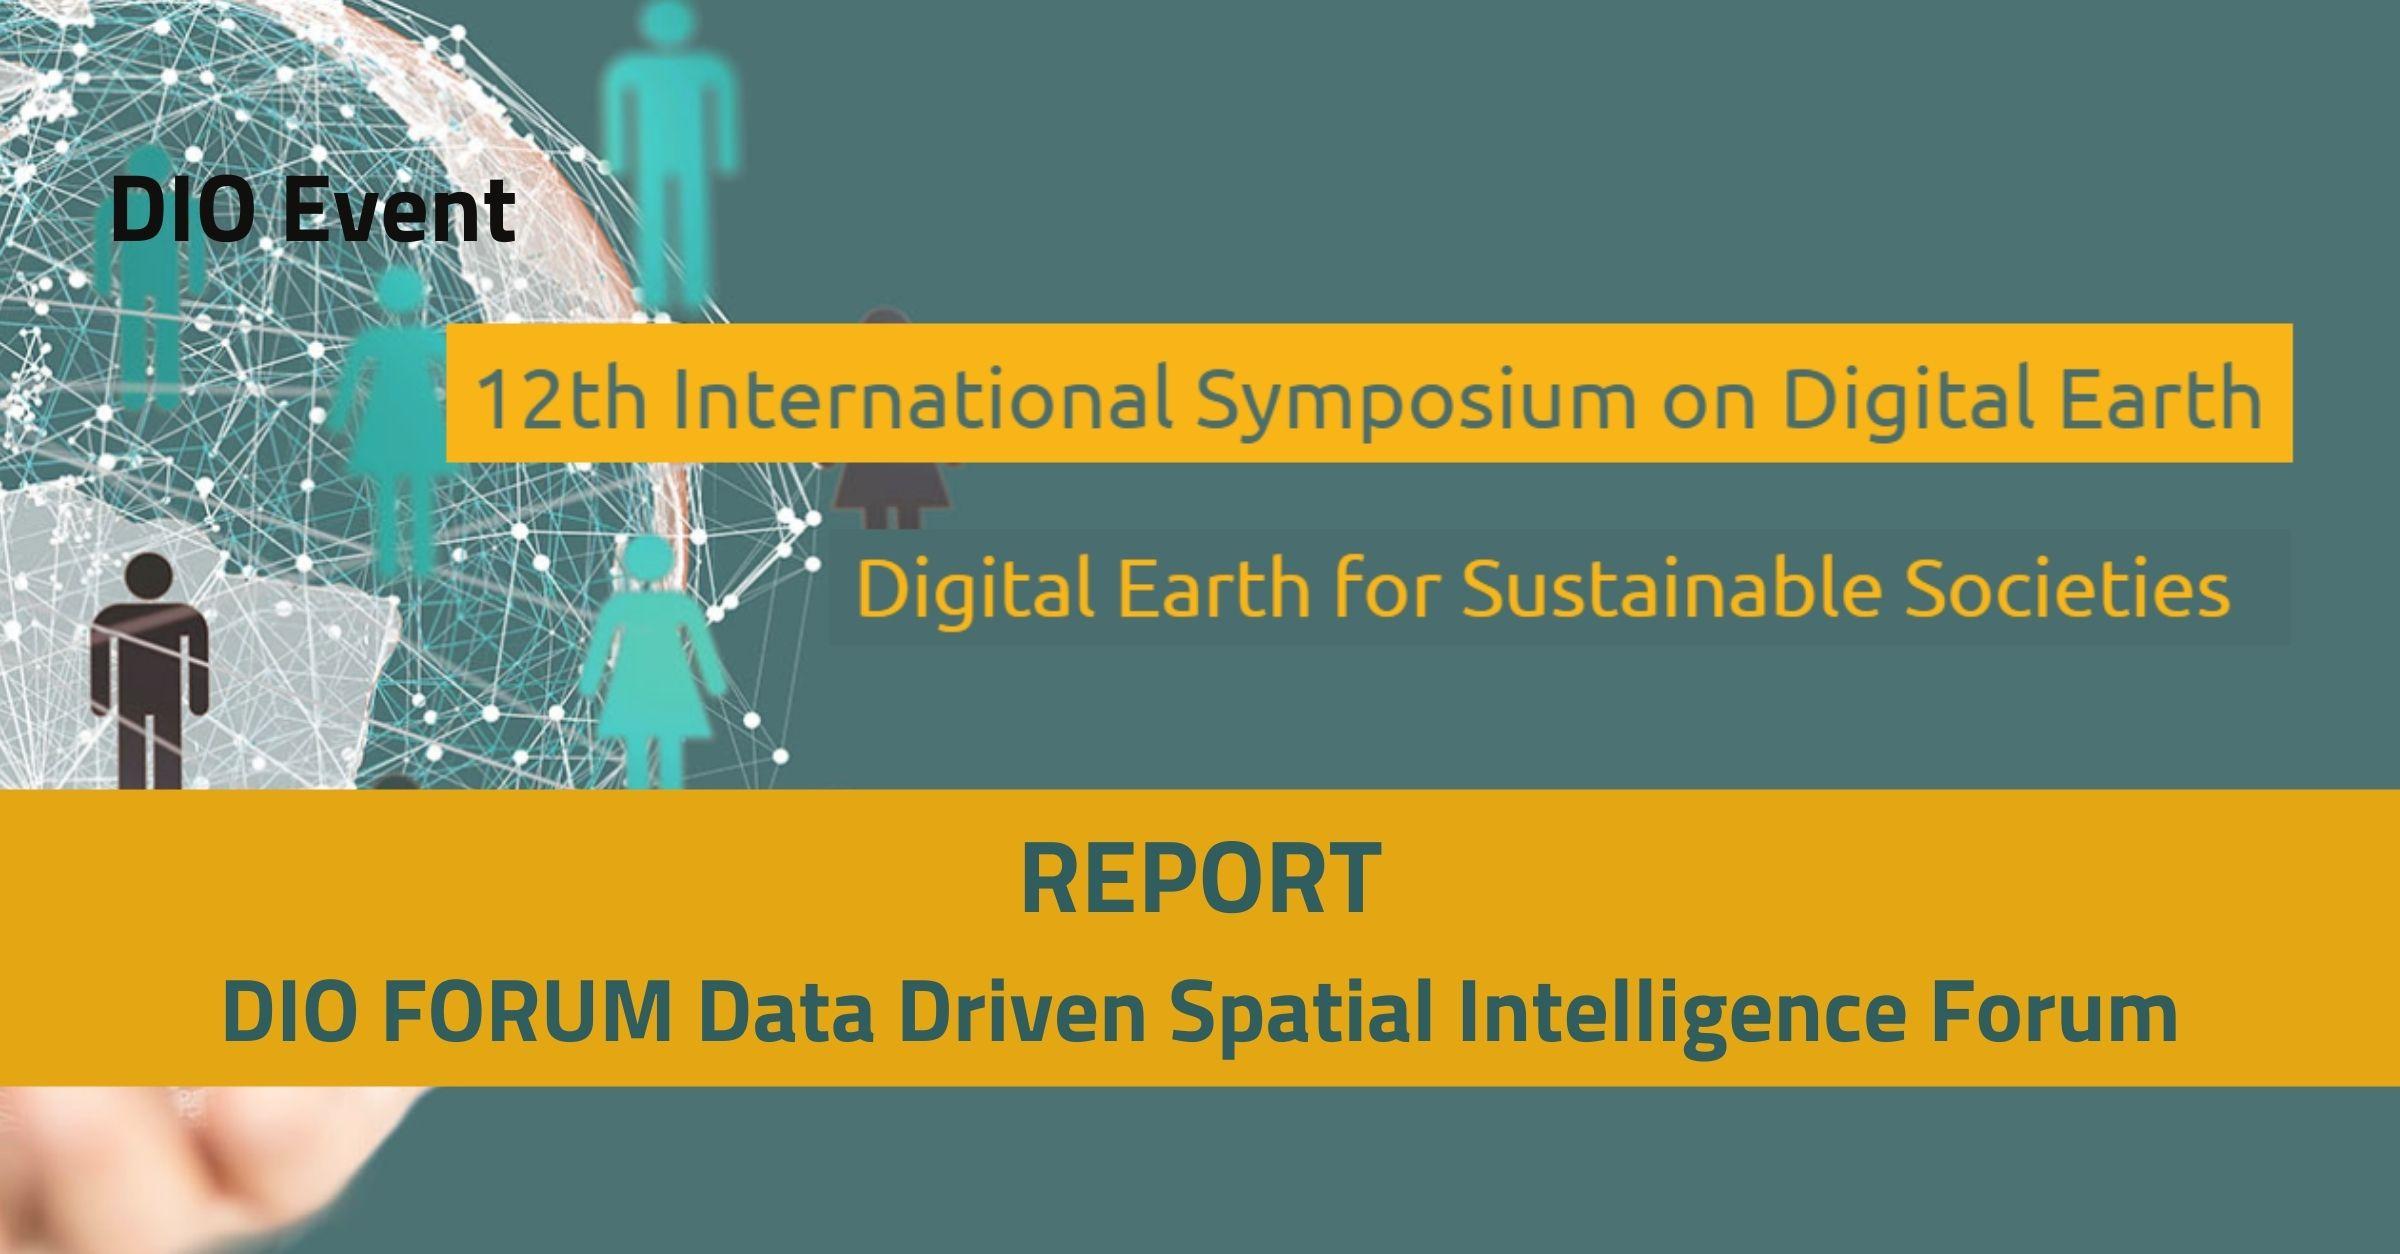 DIO FORUM Data Driven Spatial Intelligence Forum